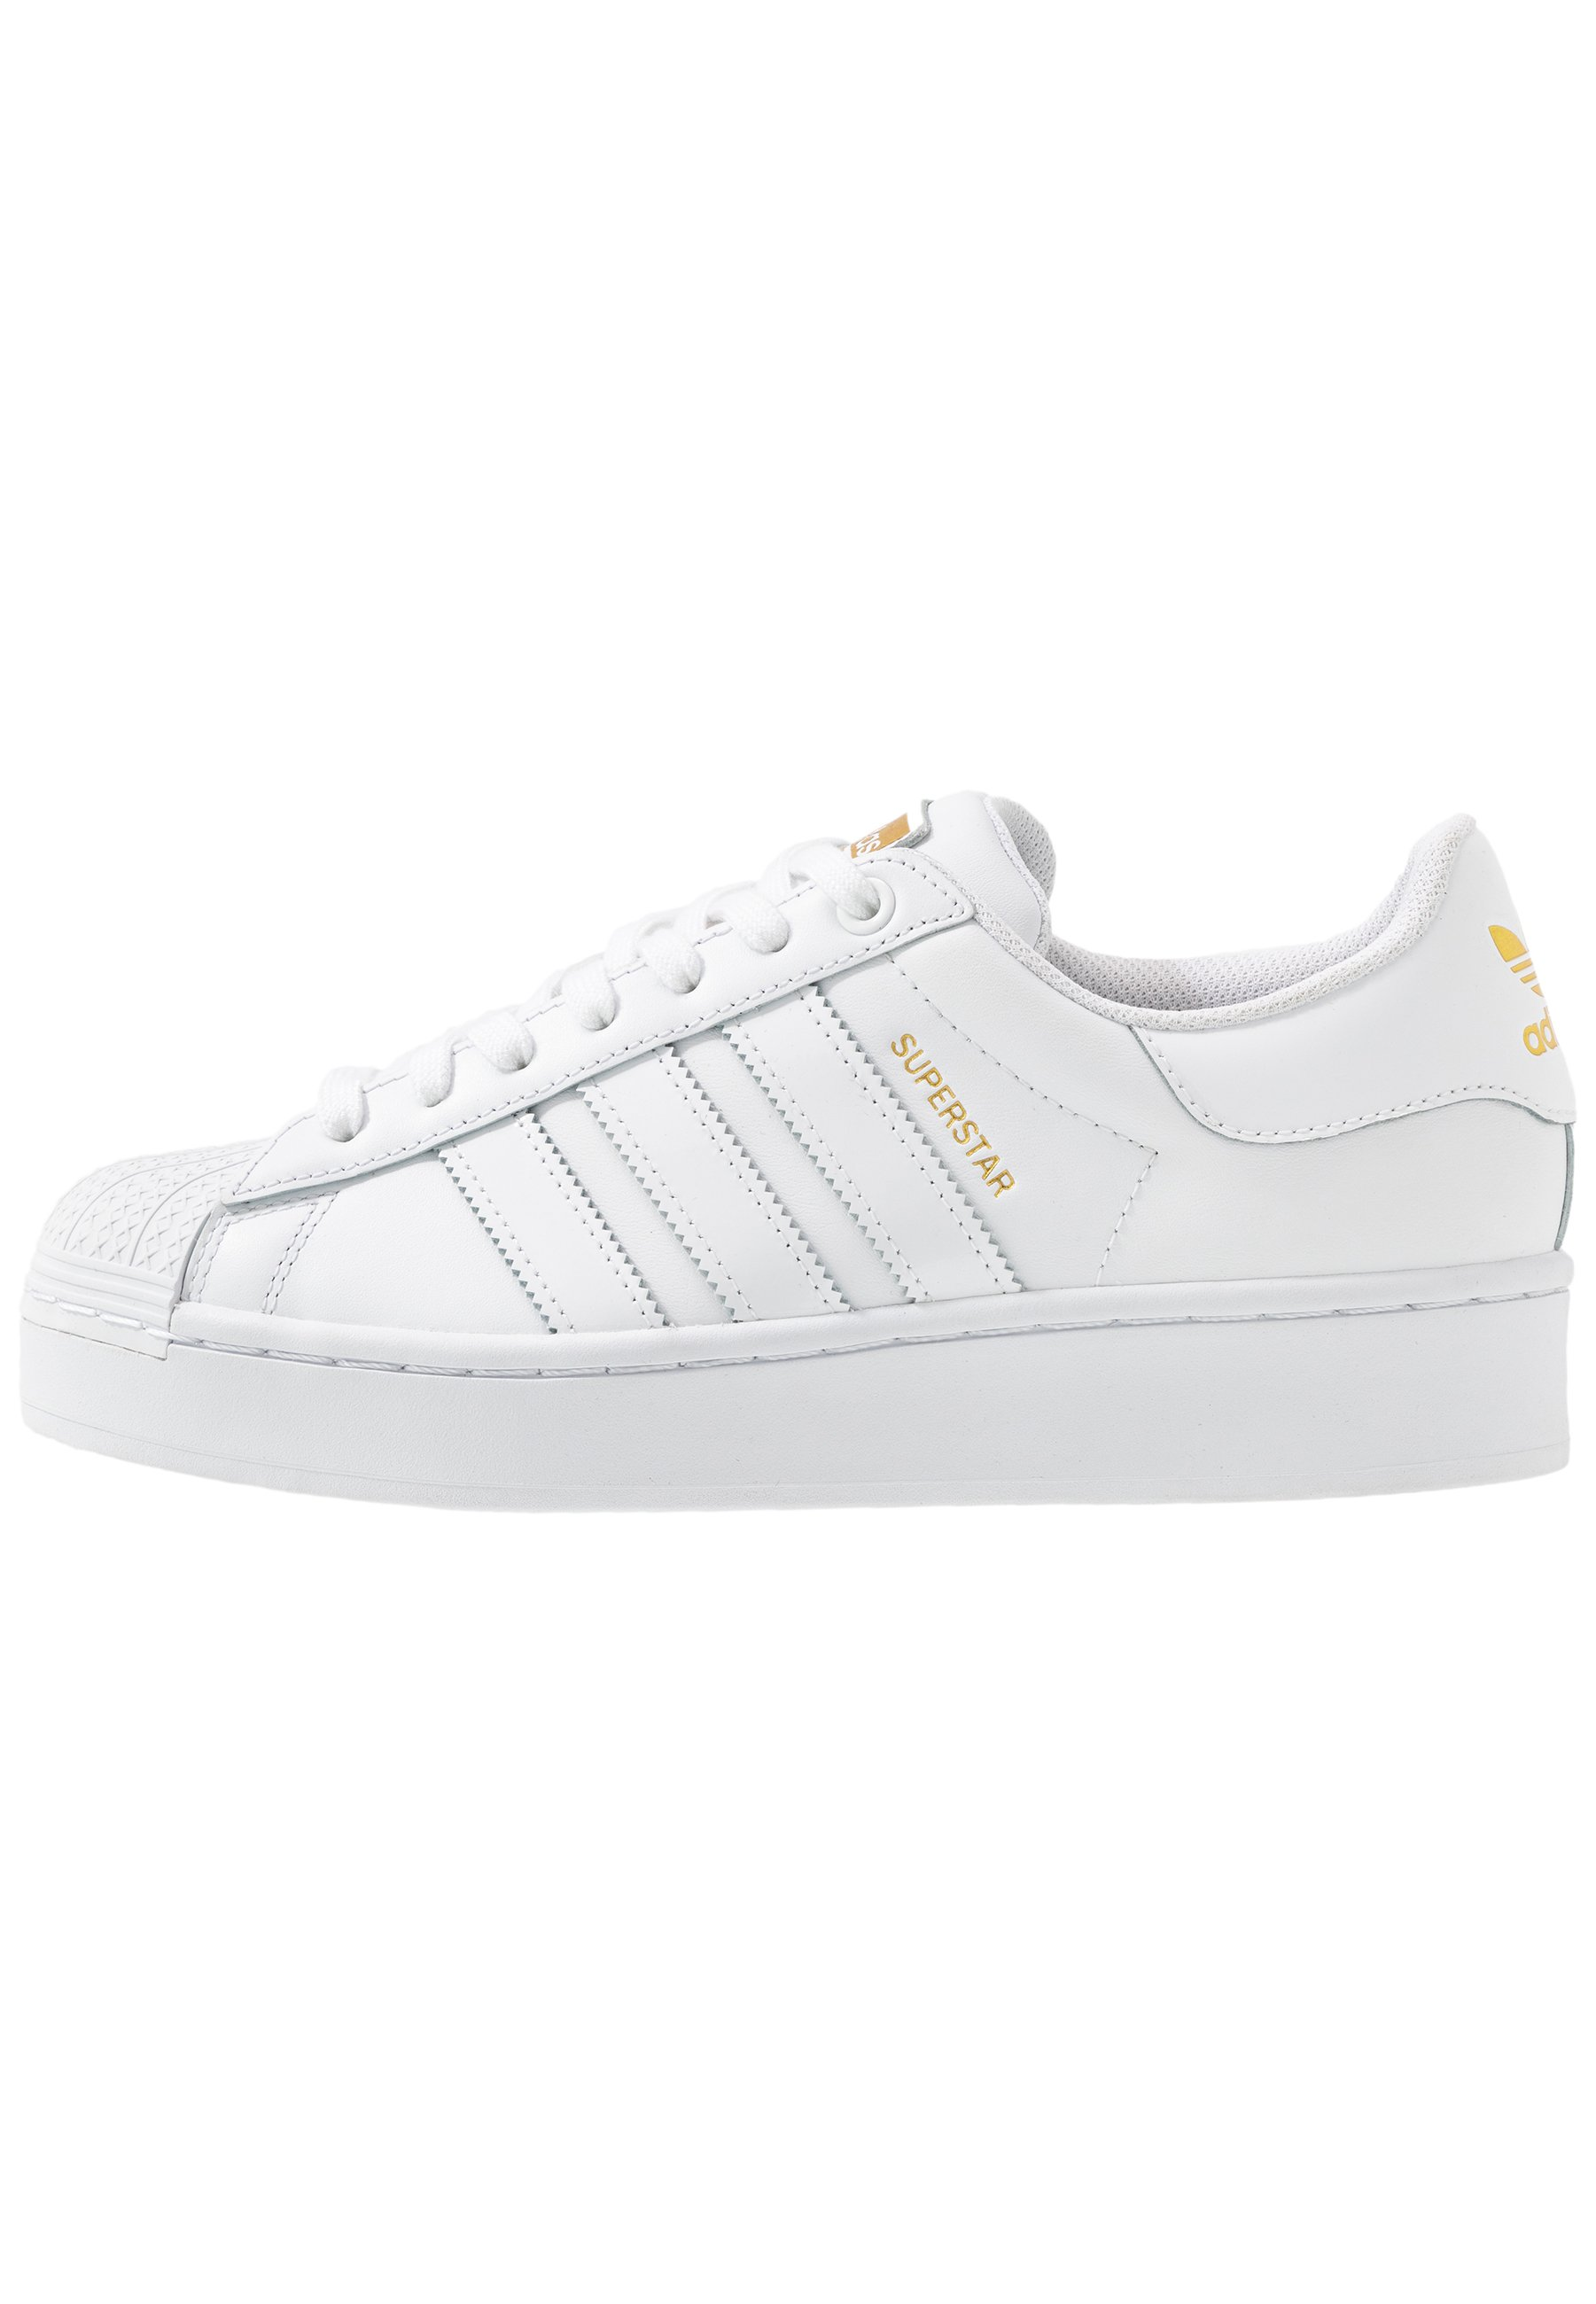 Adidas Originals Superstar Bold - Sneakers Basse Footwear White/gold Metallic IPzU4lg